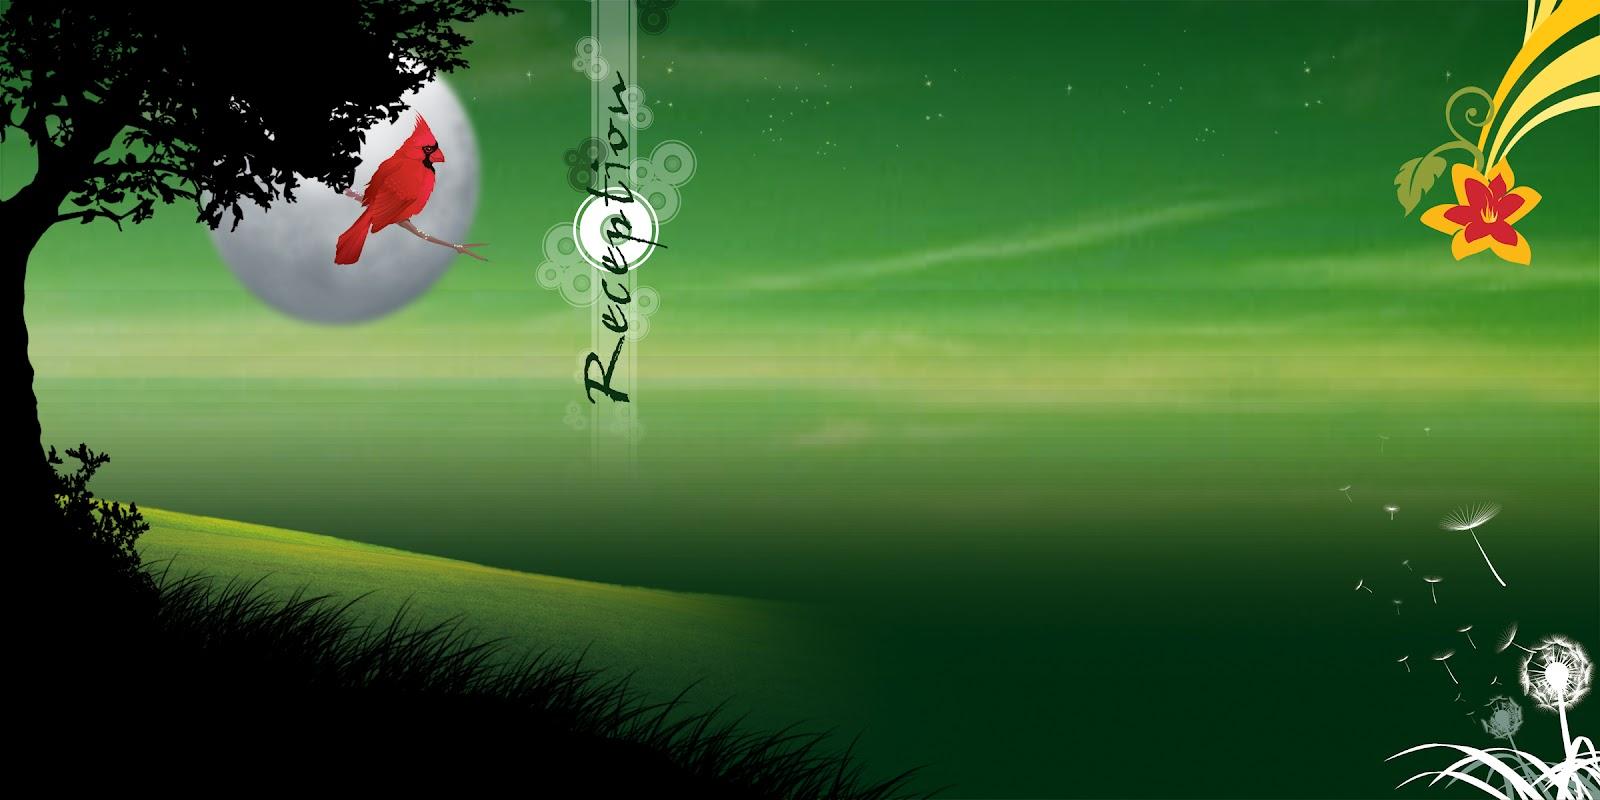 Karizma Album Background 3d | Joy Studio Design Gallery - Best Design